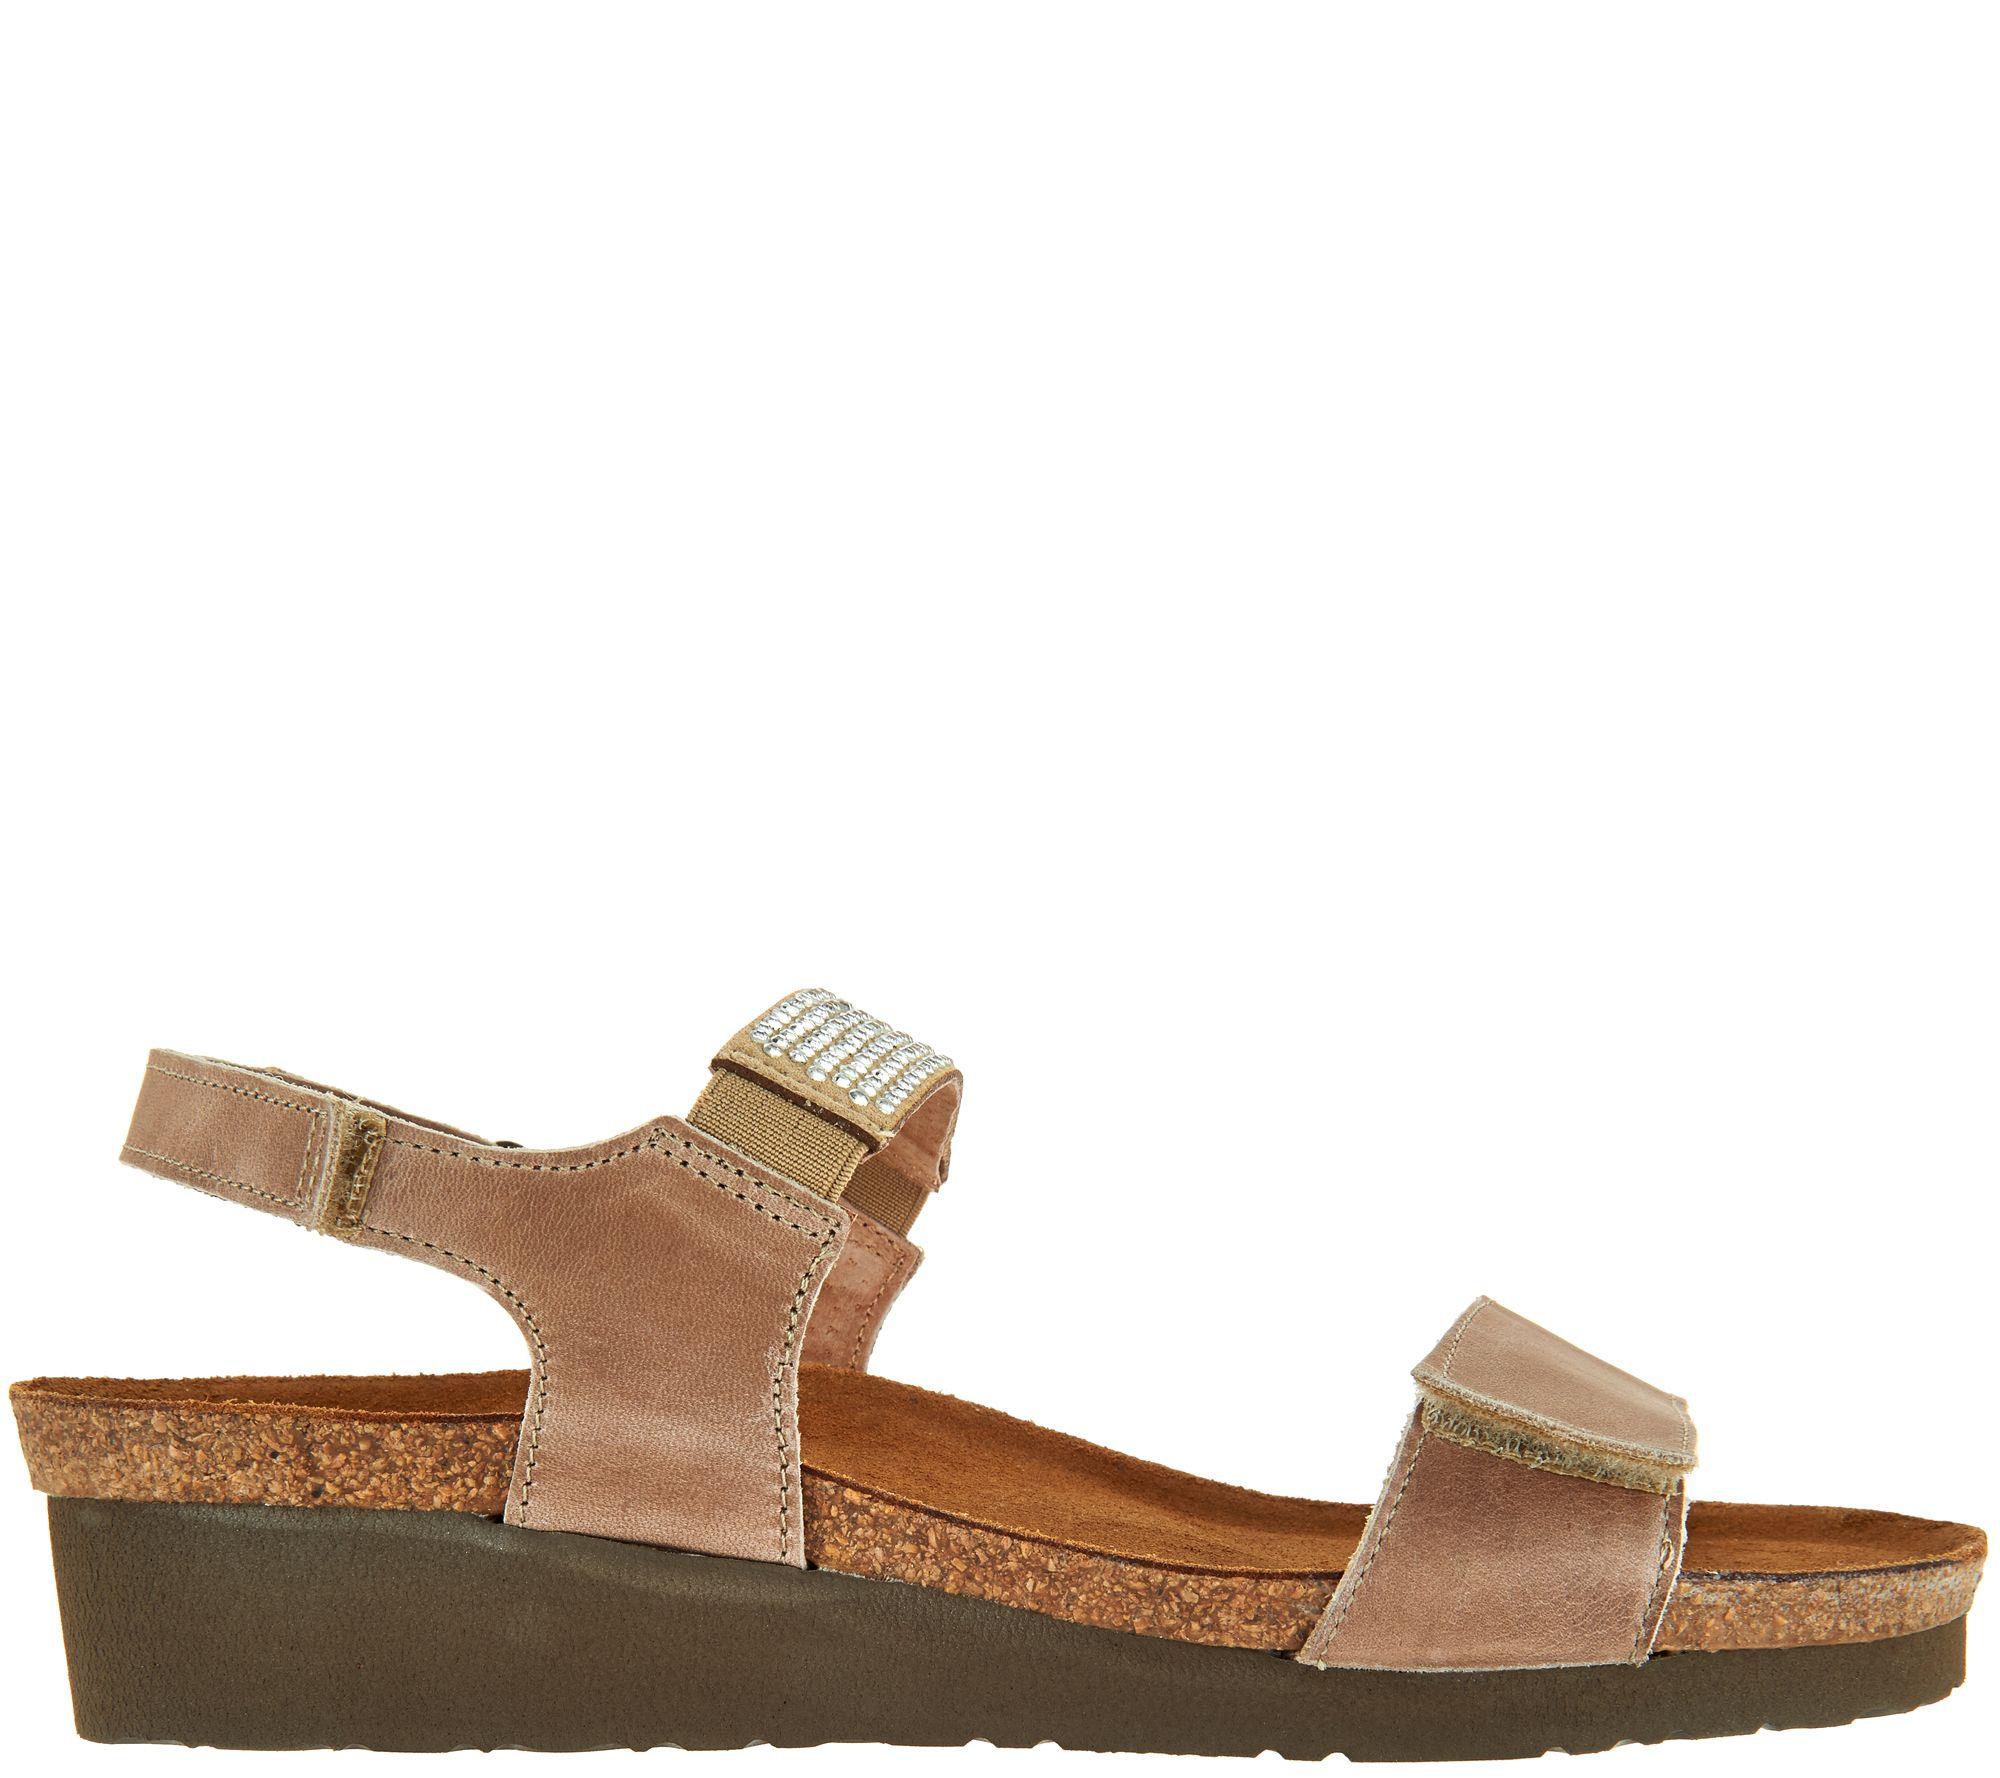 04844dafff5b Naot Leather Embellished Sandals - Lisa - Page 1 — QVC.com